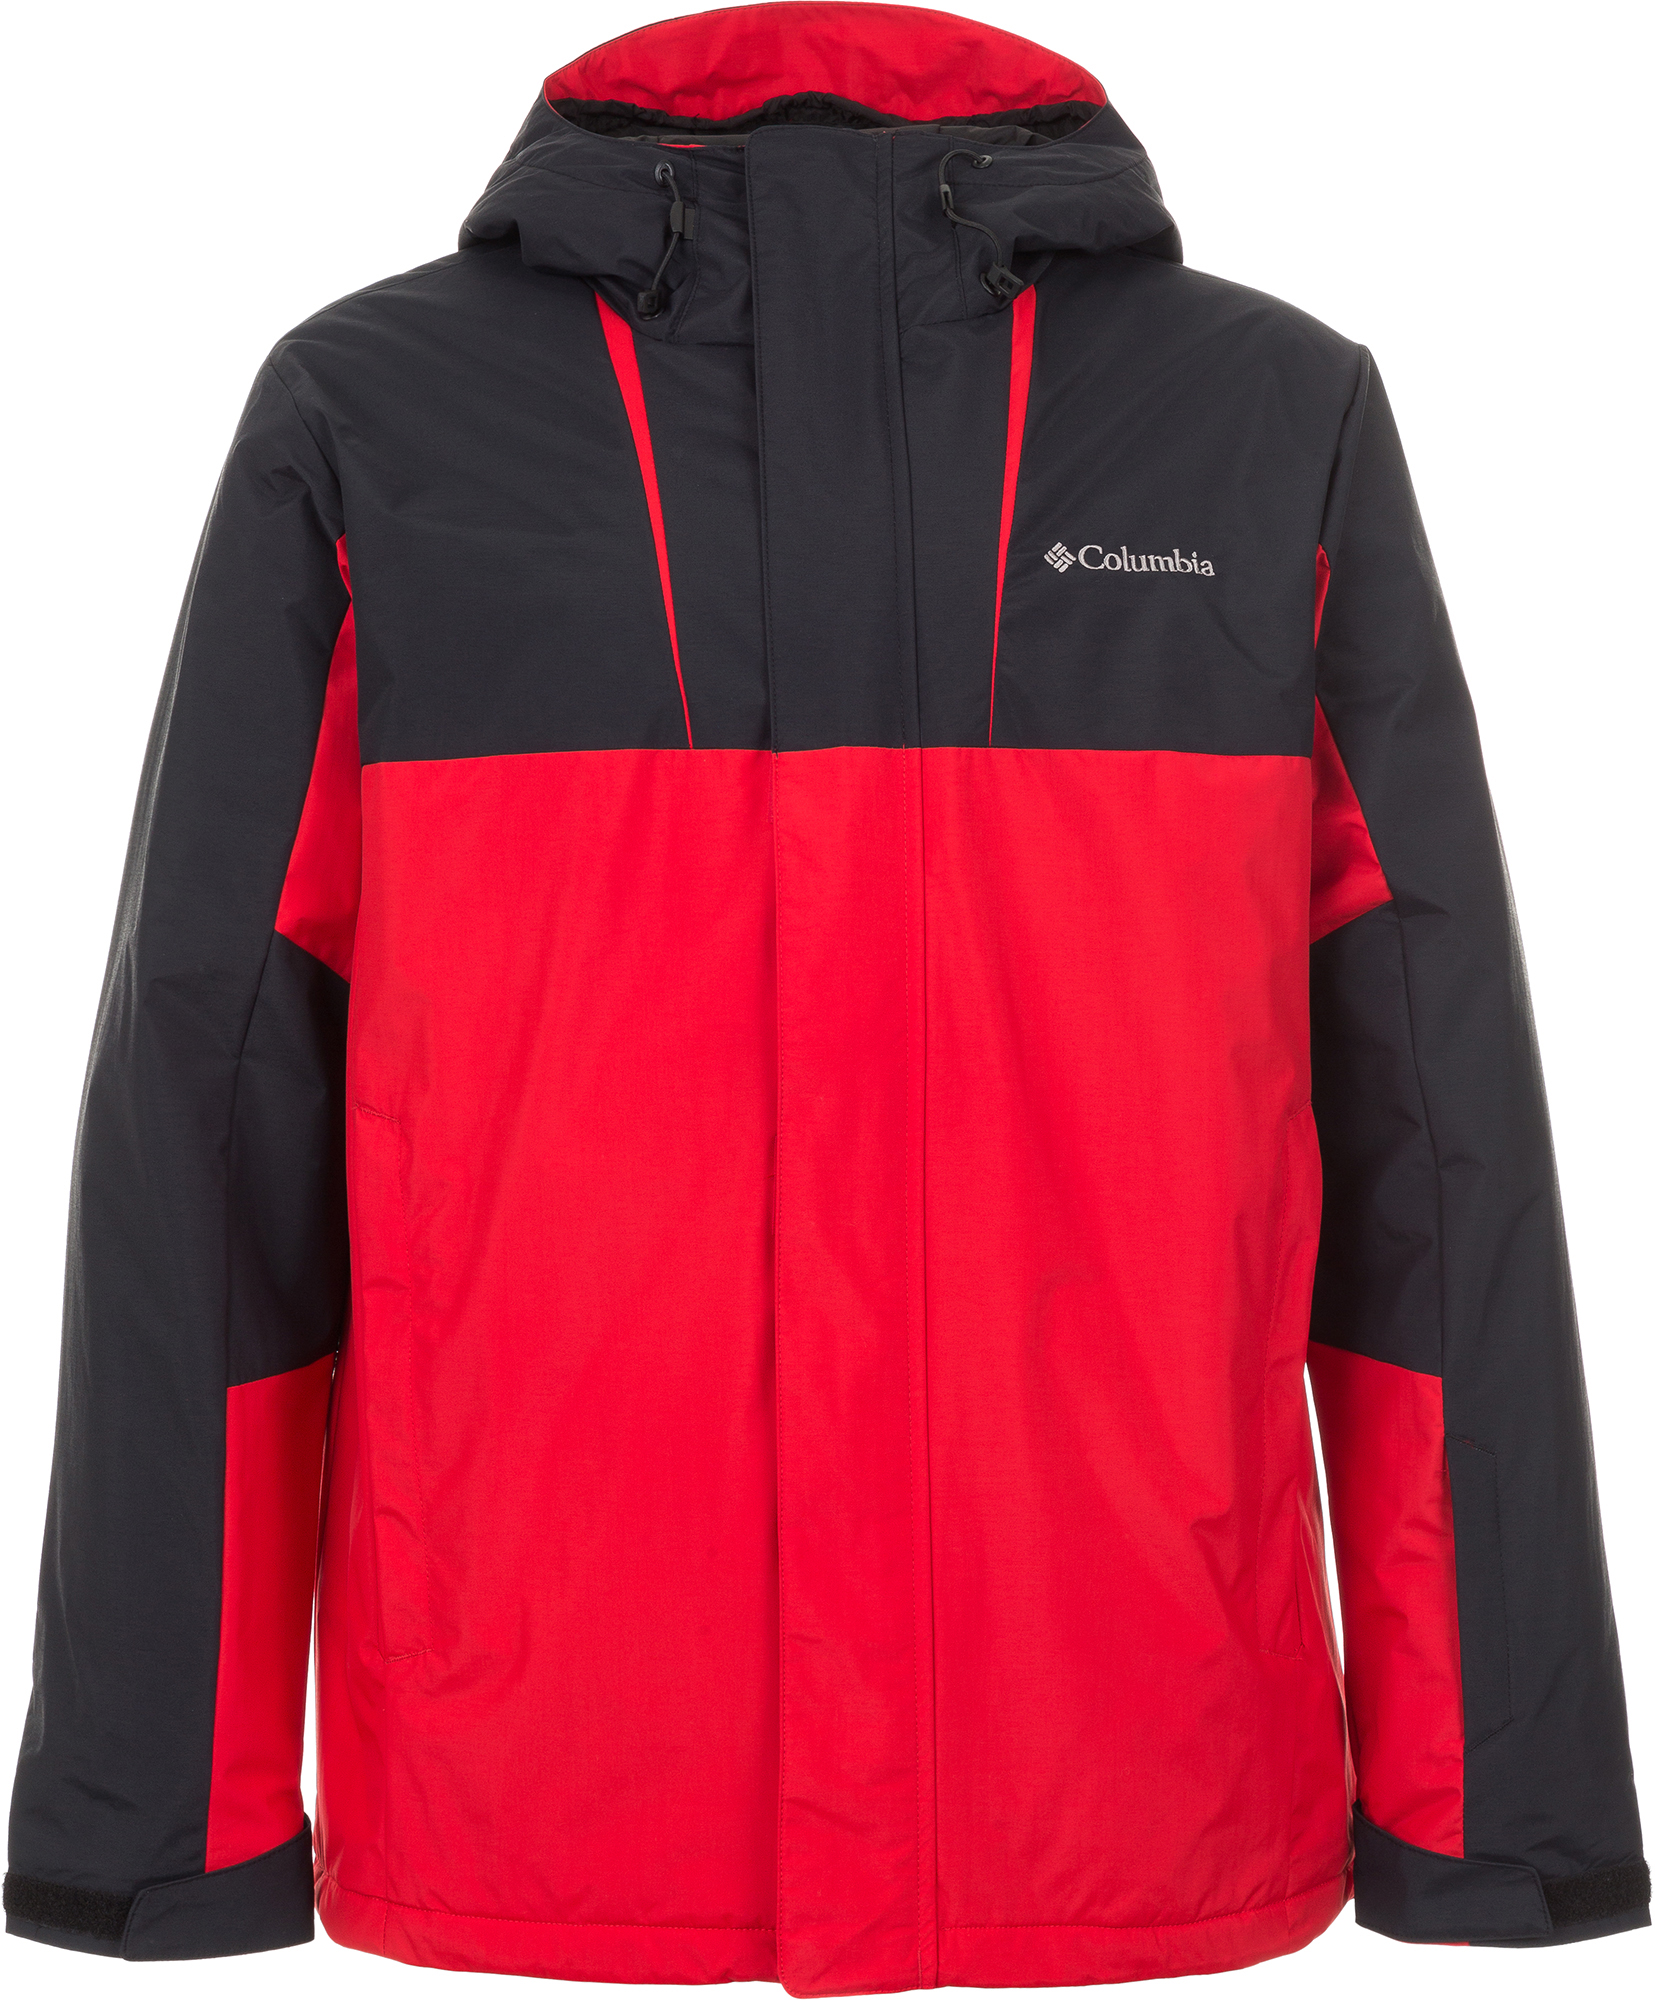 Columbia Куртка мужская Columbia Tumalo Falls Insulated, размер 48-50 columbia куртка 3 в 1 мужская columbia whirlibird размер 48 50